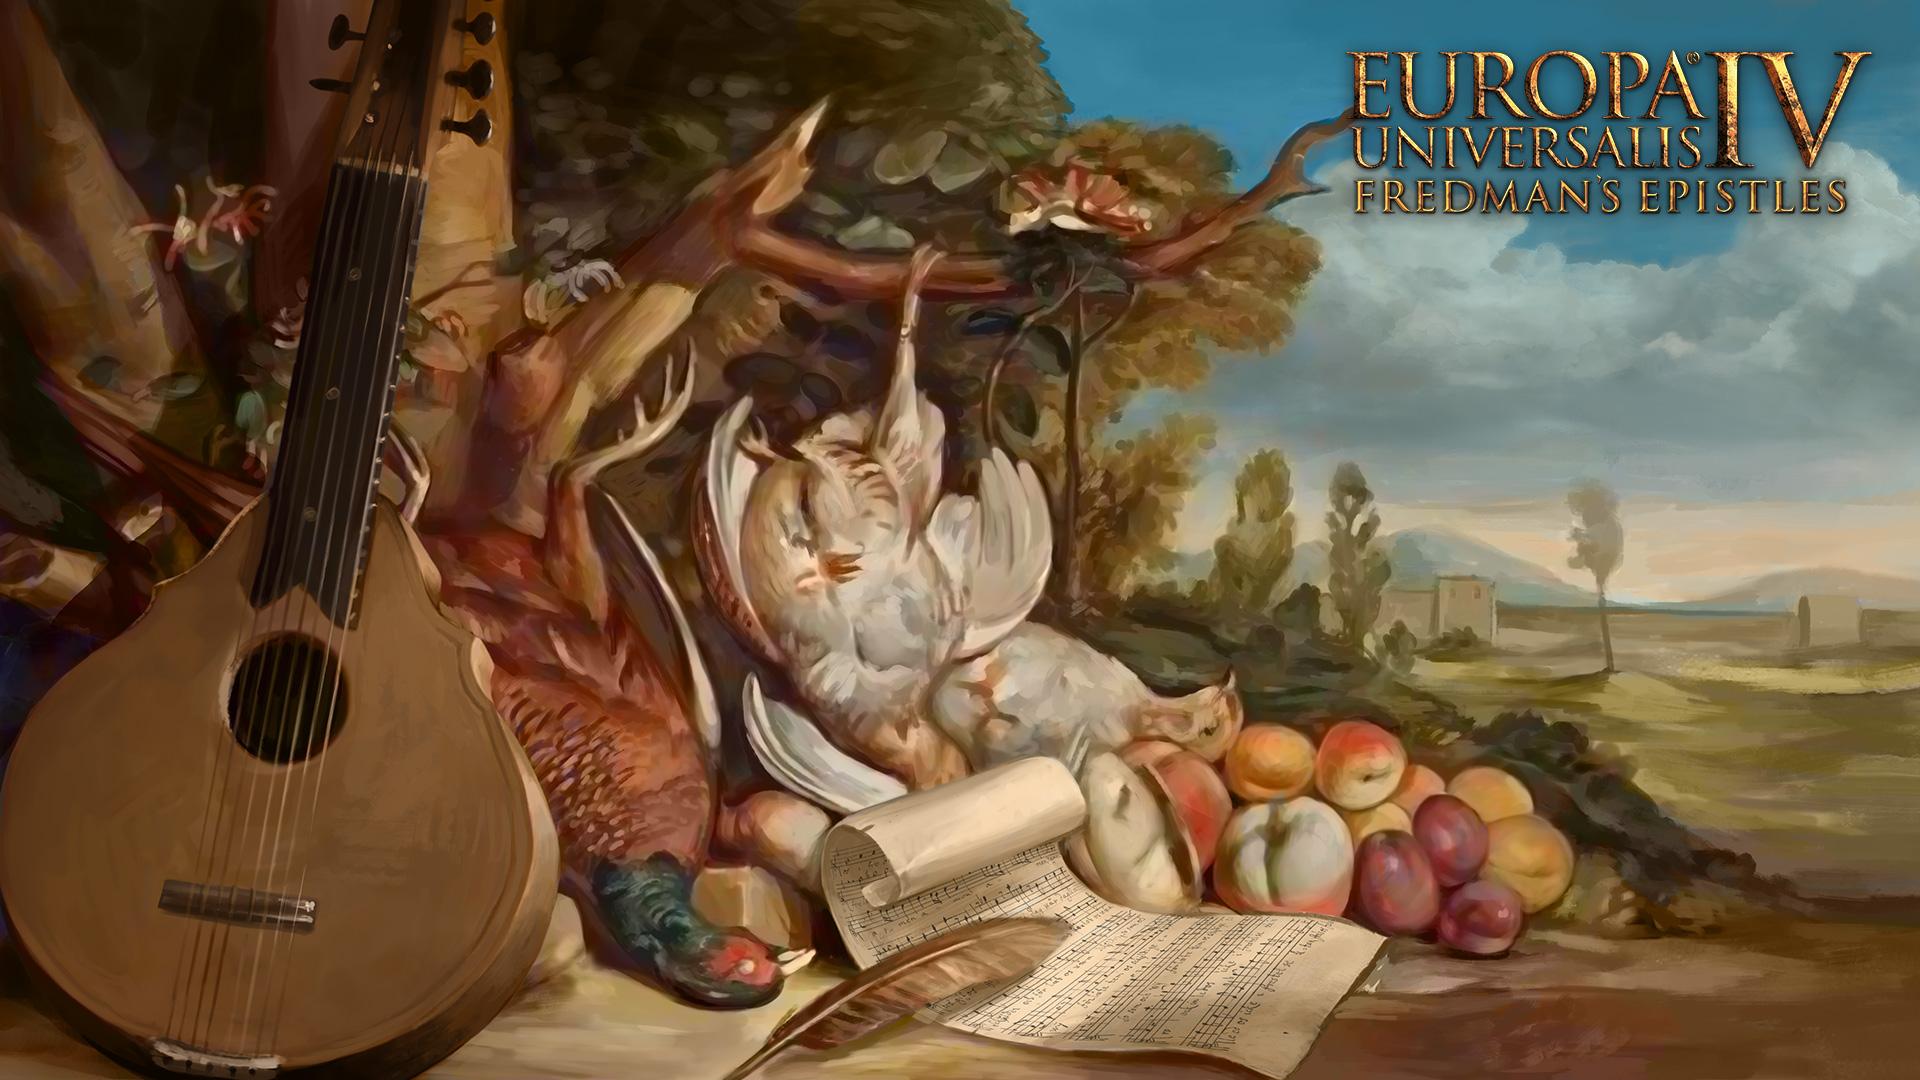 europa_universalis_4_fredmans_epistles